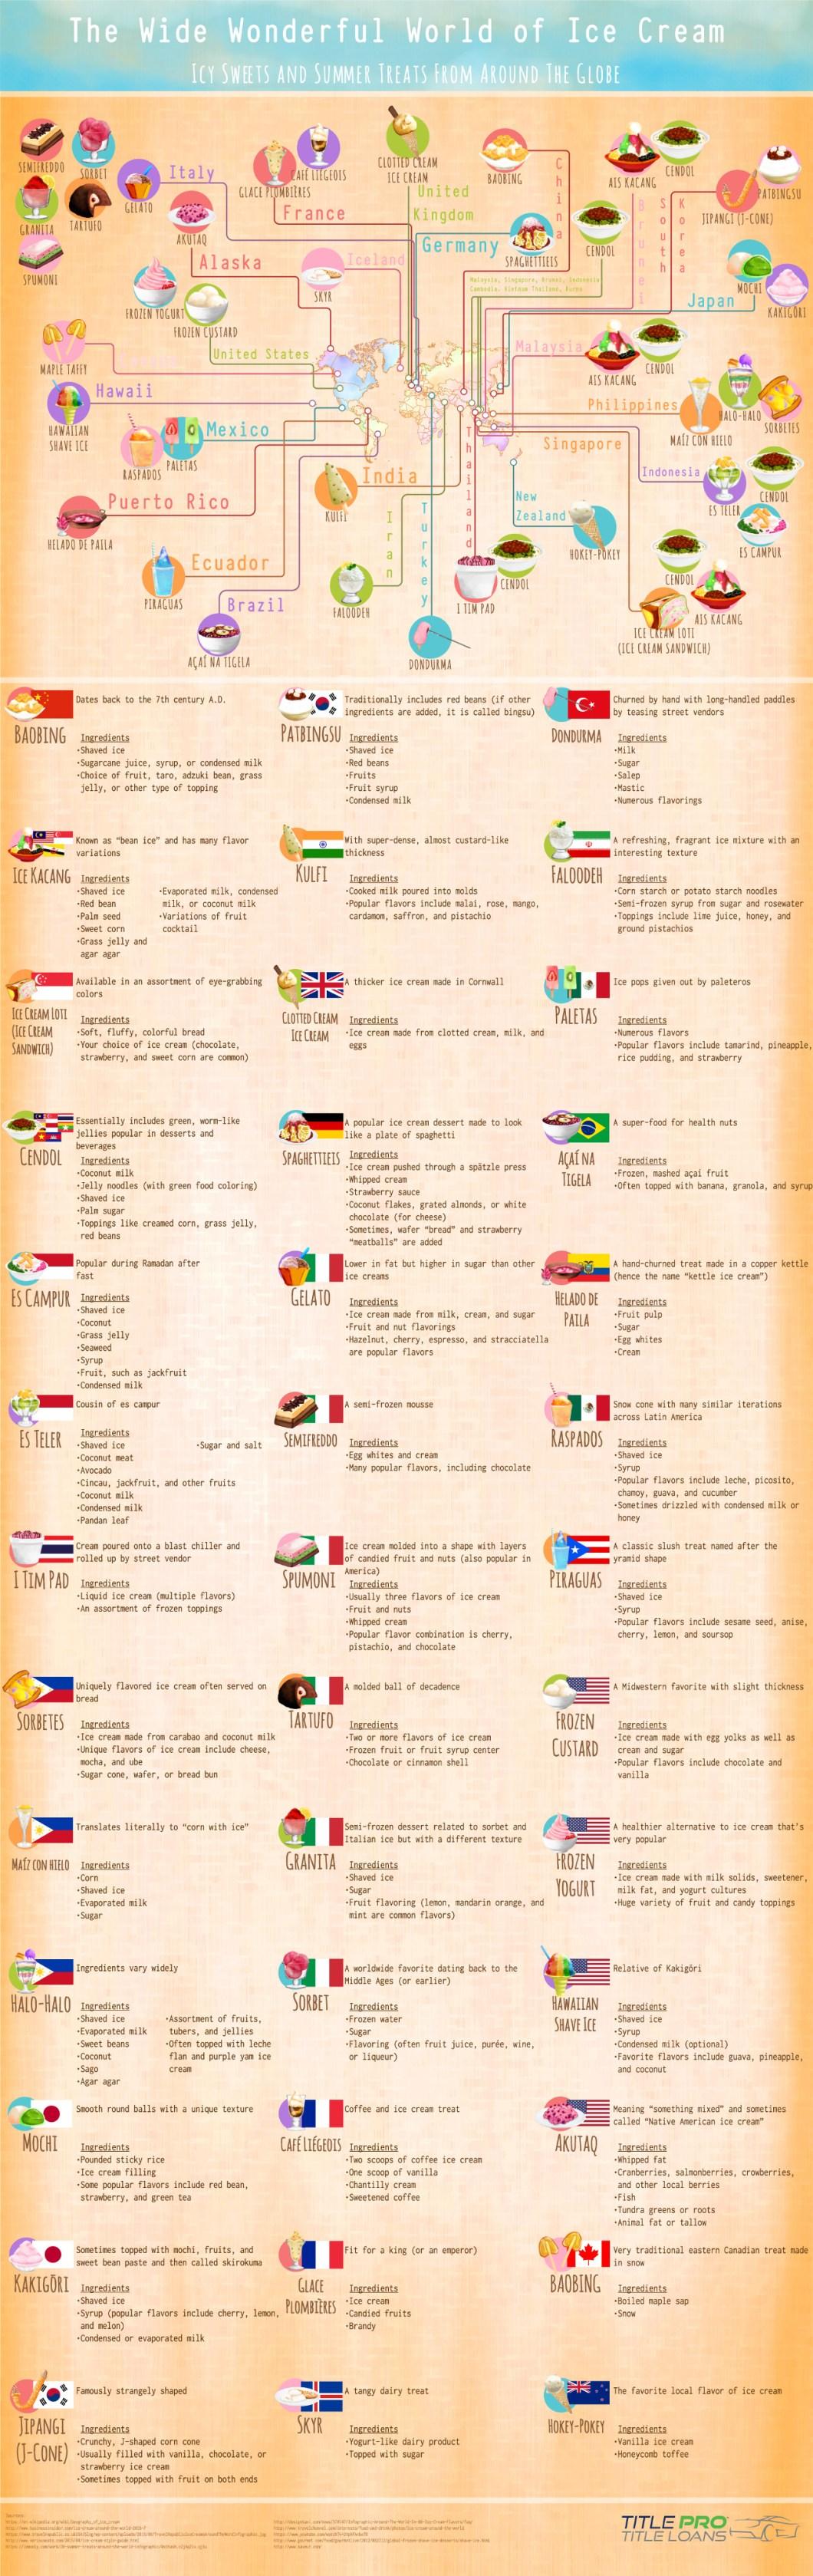 Ice Cream Flavors Around The World - Infographic